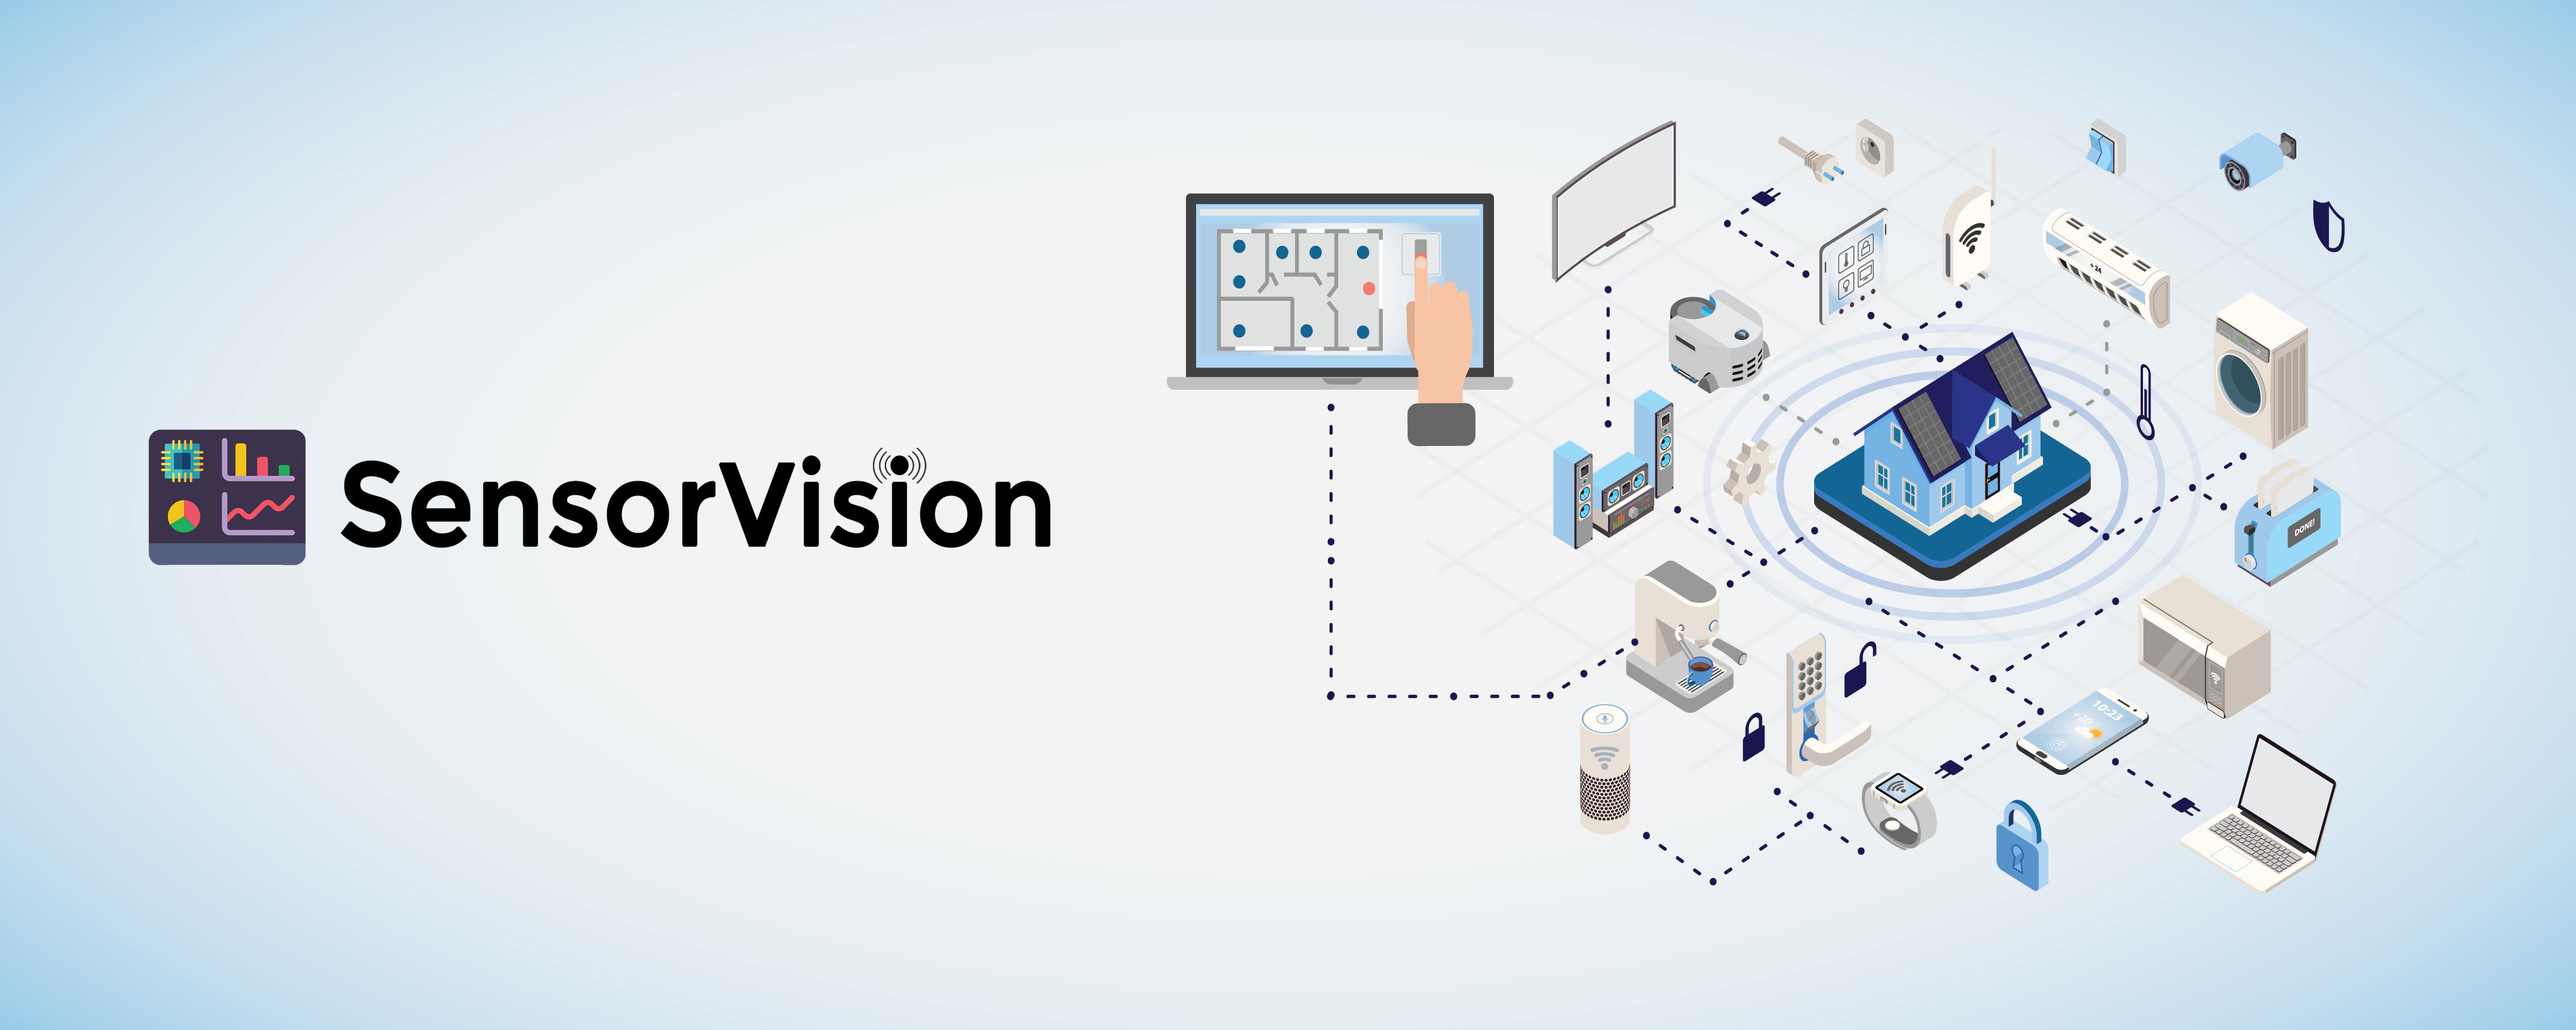 SensorVision IoT Platform